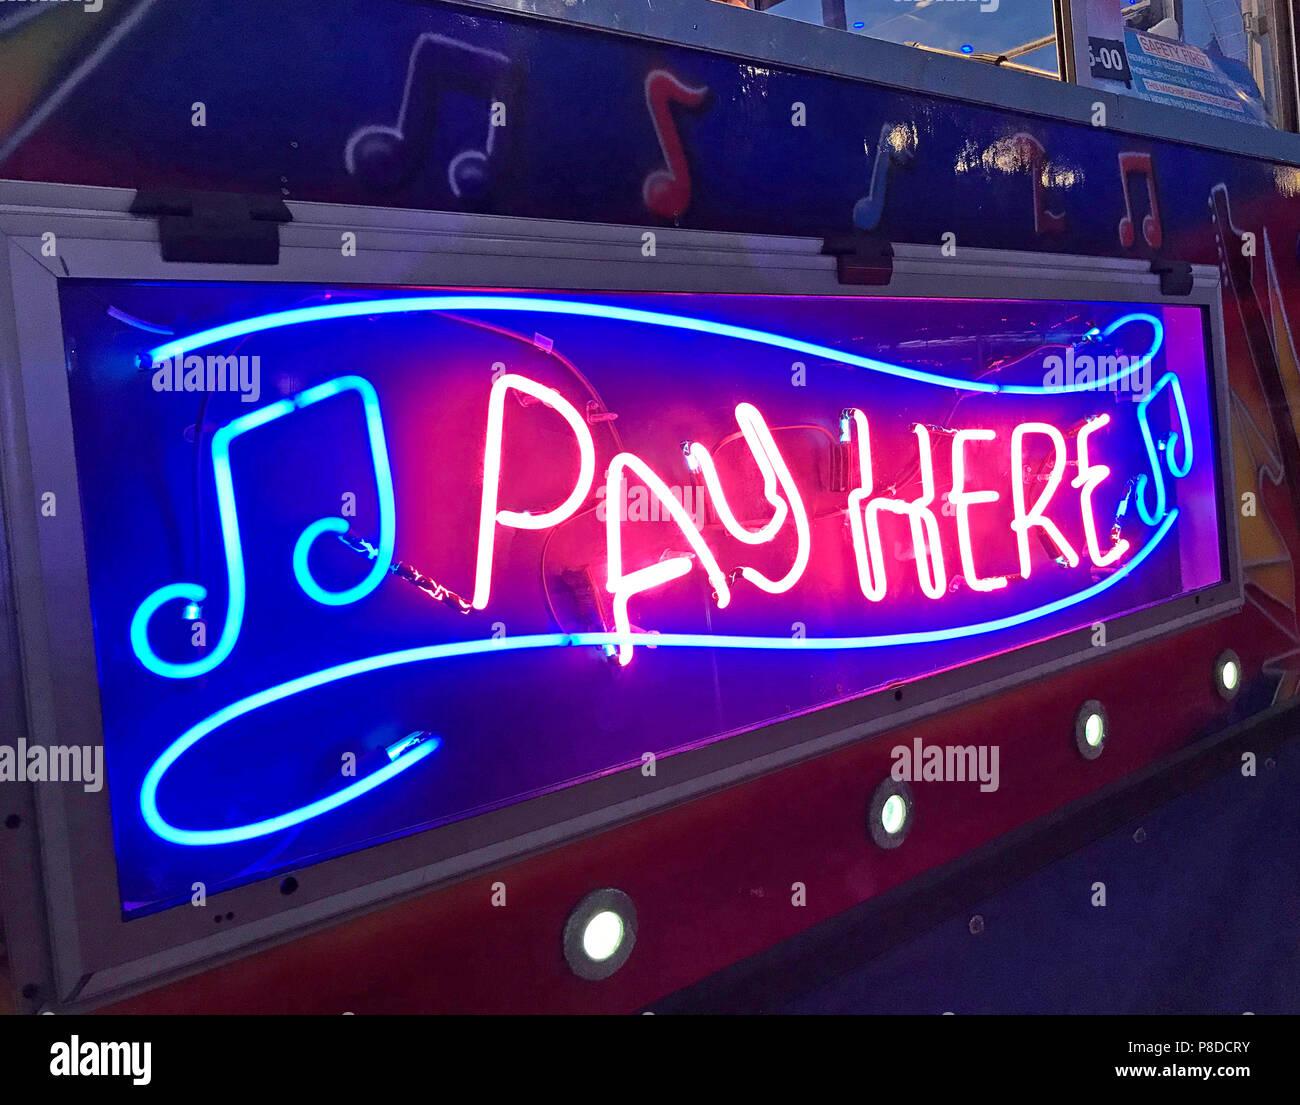 @HotpixUK,GoTonySmith,Silverstone,racing circuit,F1,GP,Formula One,Grand Prix,GrandPrix,Silverstone Woodlands,2018,night,evening,nighttime,night time,bright,lit,light,lighted,Blue,red,Pay here neon sign